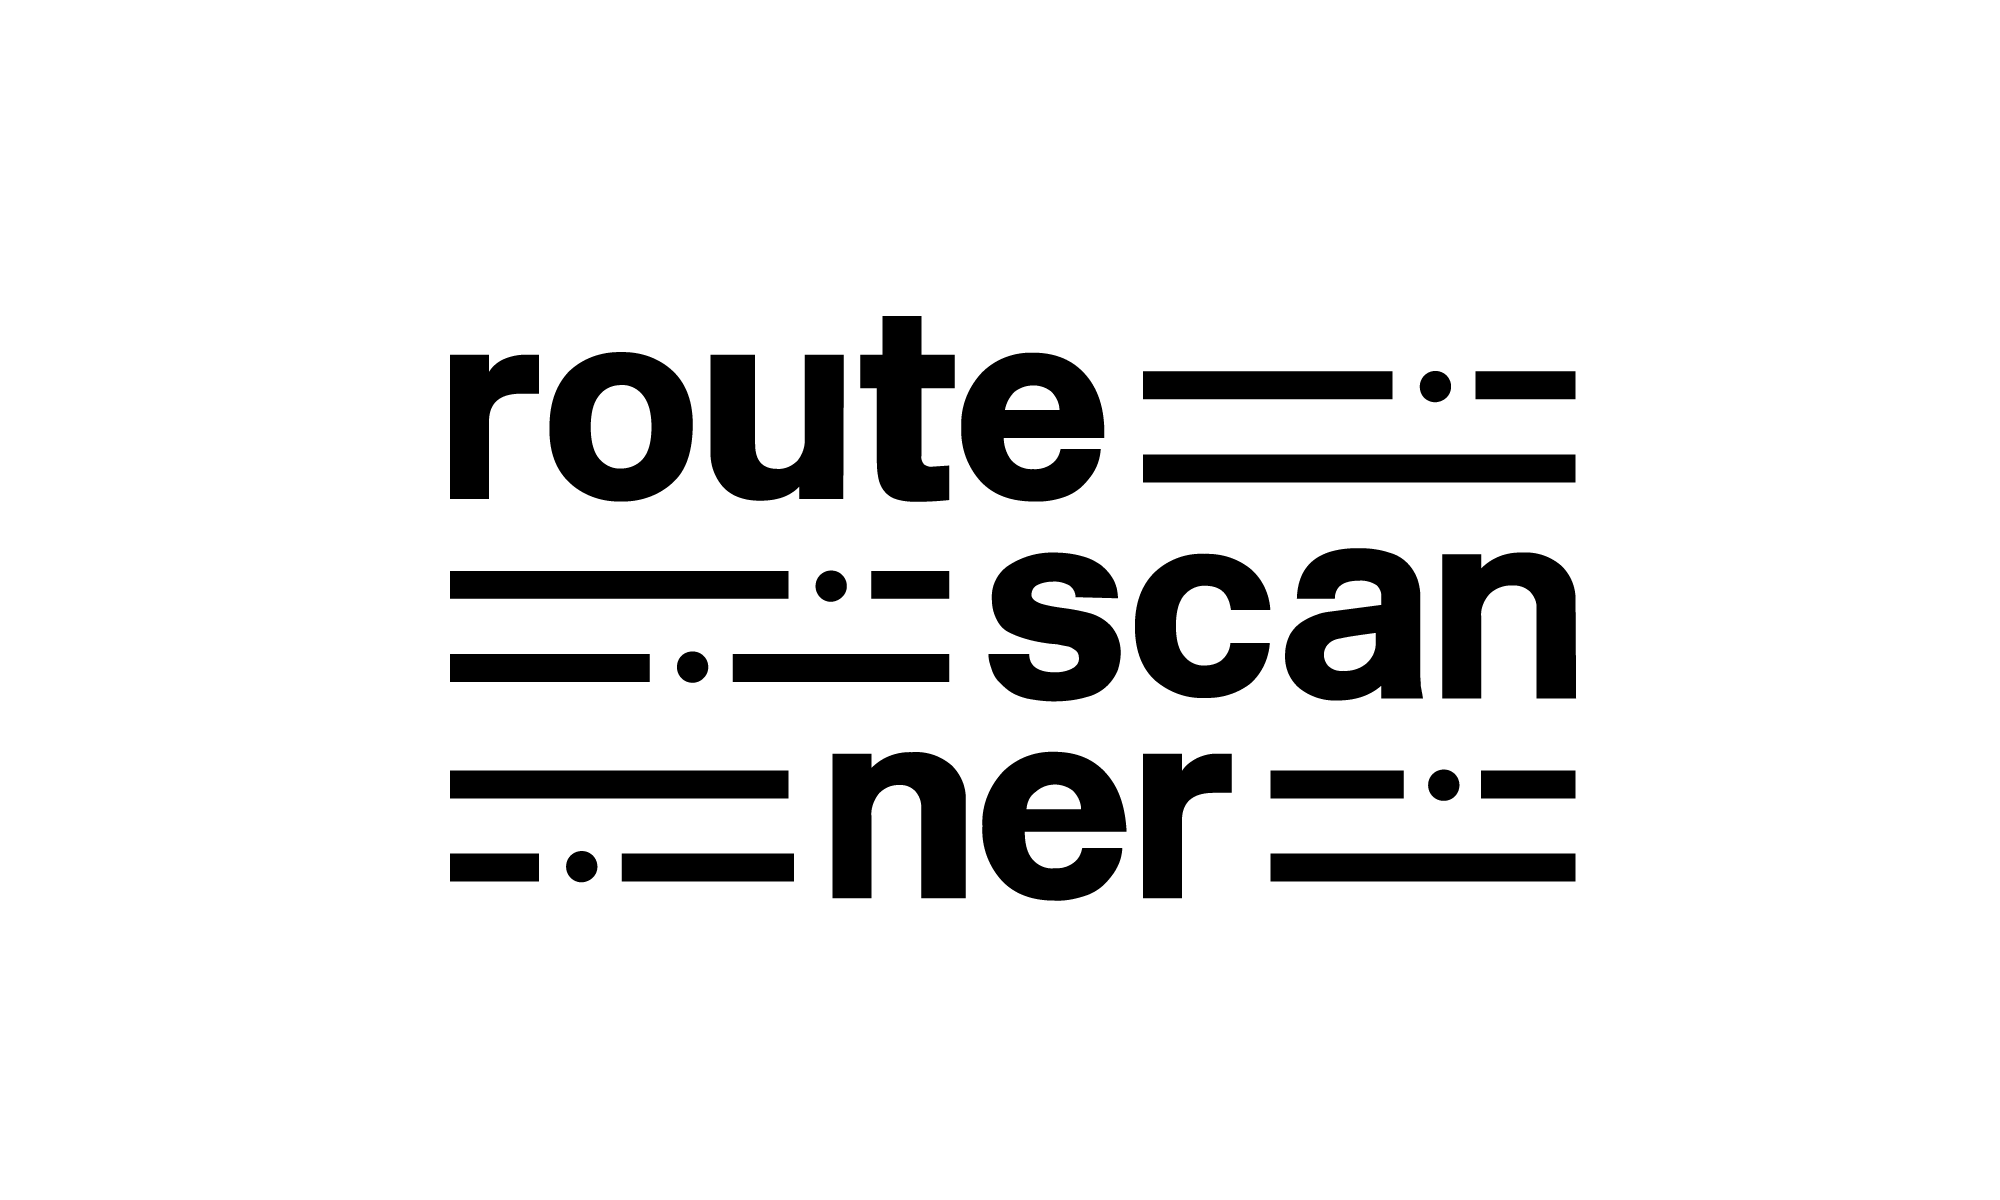 Routescanner logo